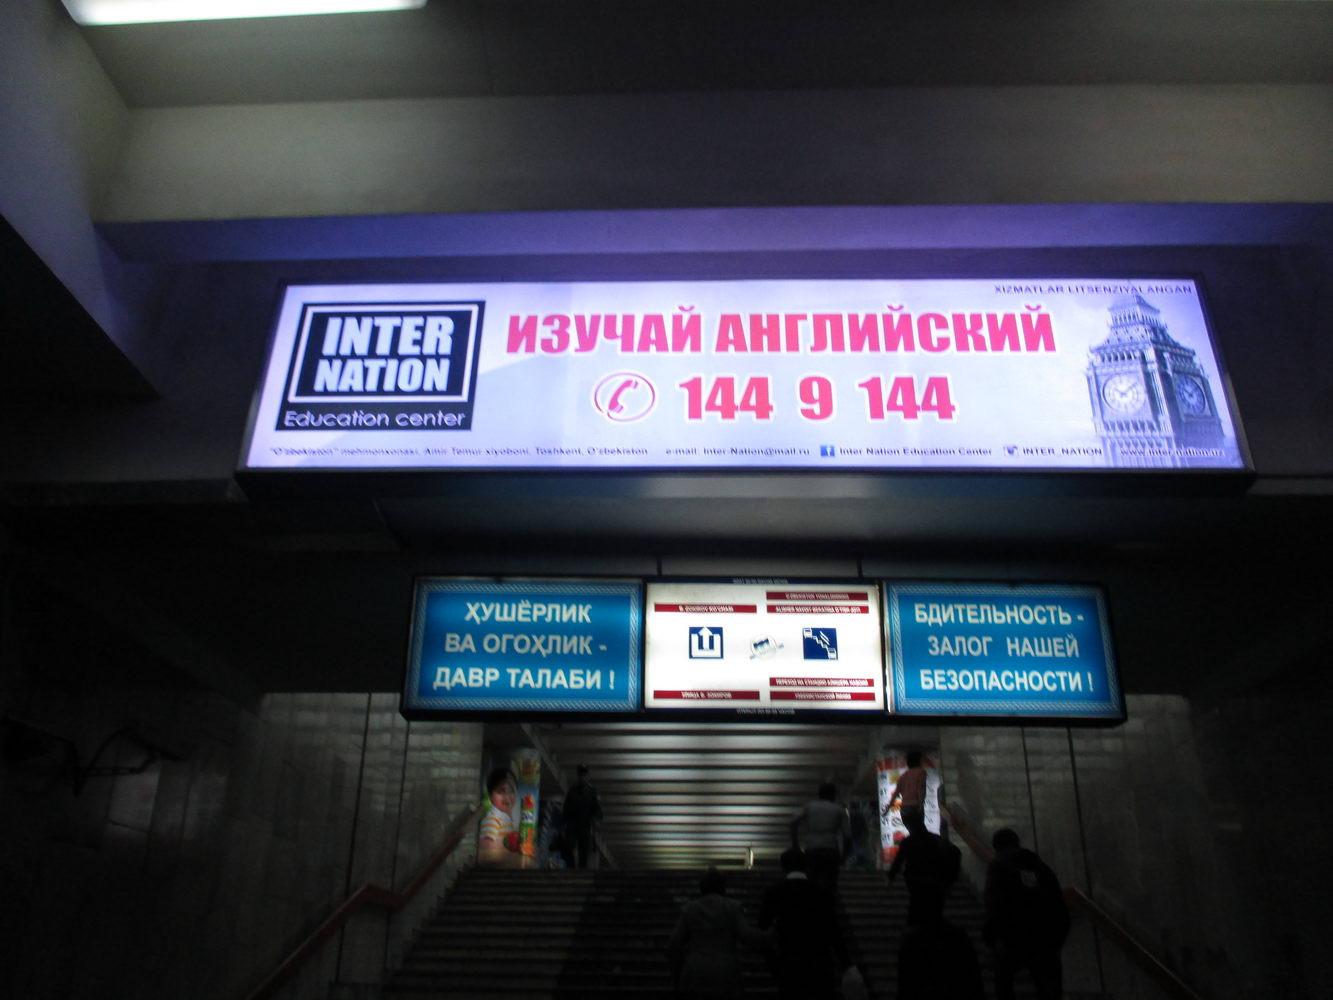 метро бдительность залог вашей безопасности. узбекистан ташкент